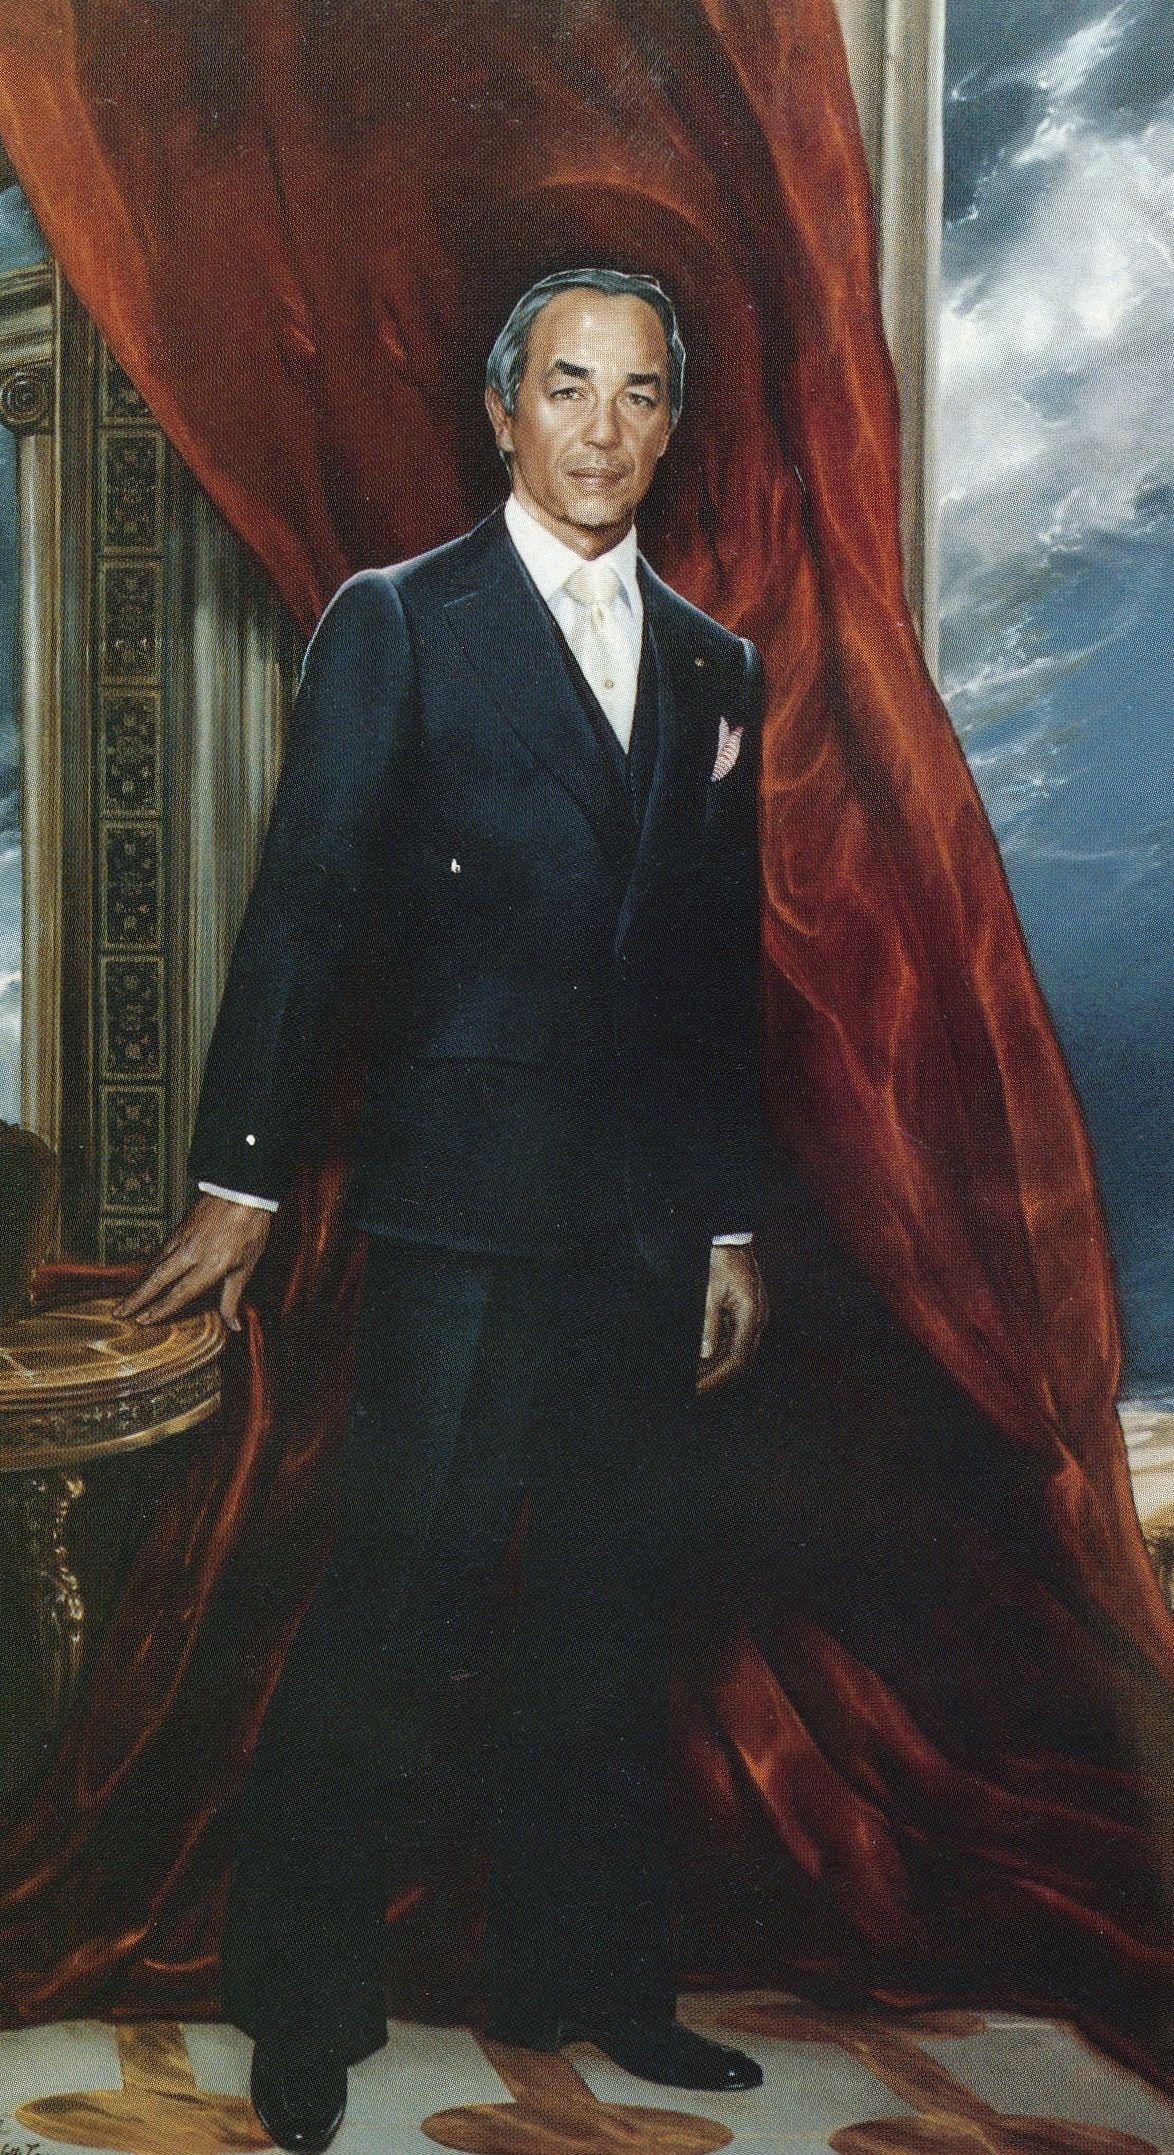 H M King Hassan Ii 52 X 90 Oil On Canvas Painted By Ralph Wolfe Cowan Cowan Art History Portrait Artist